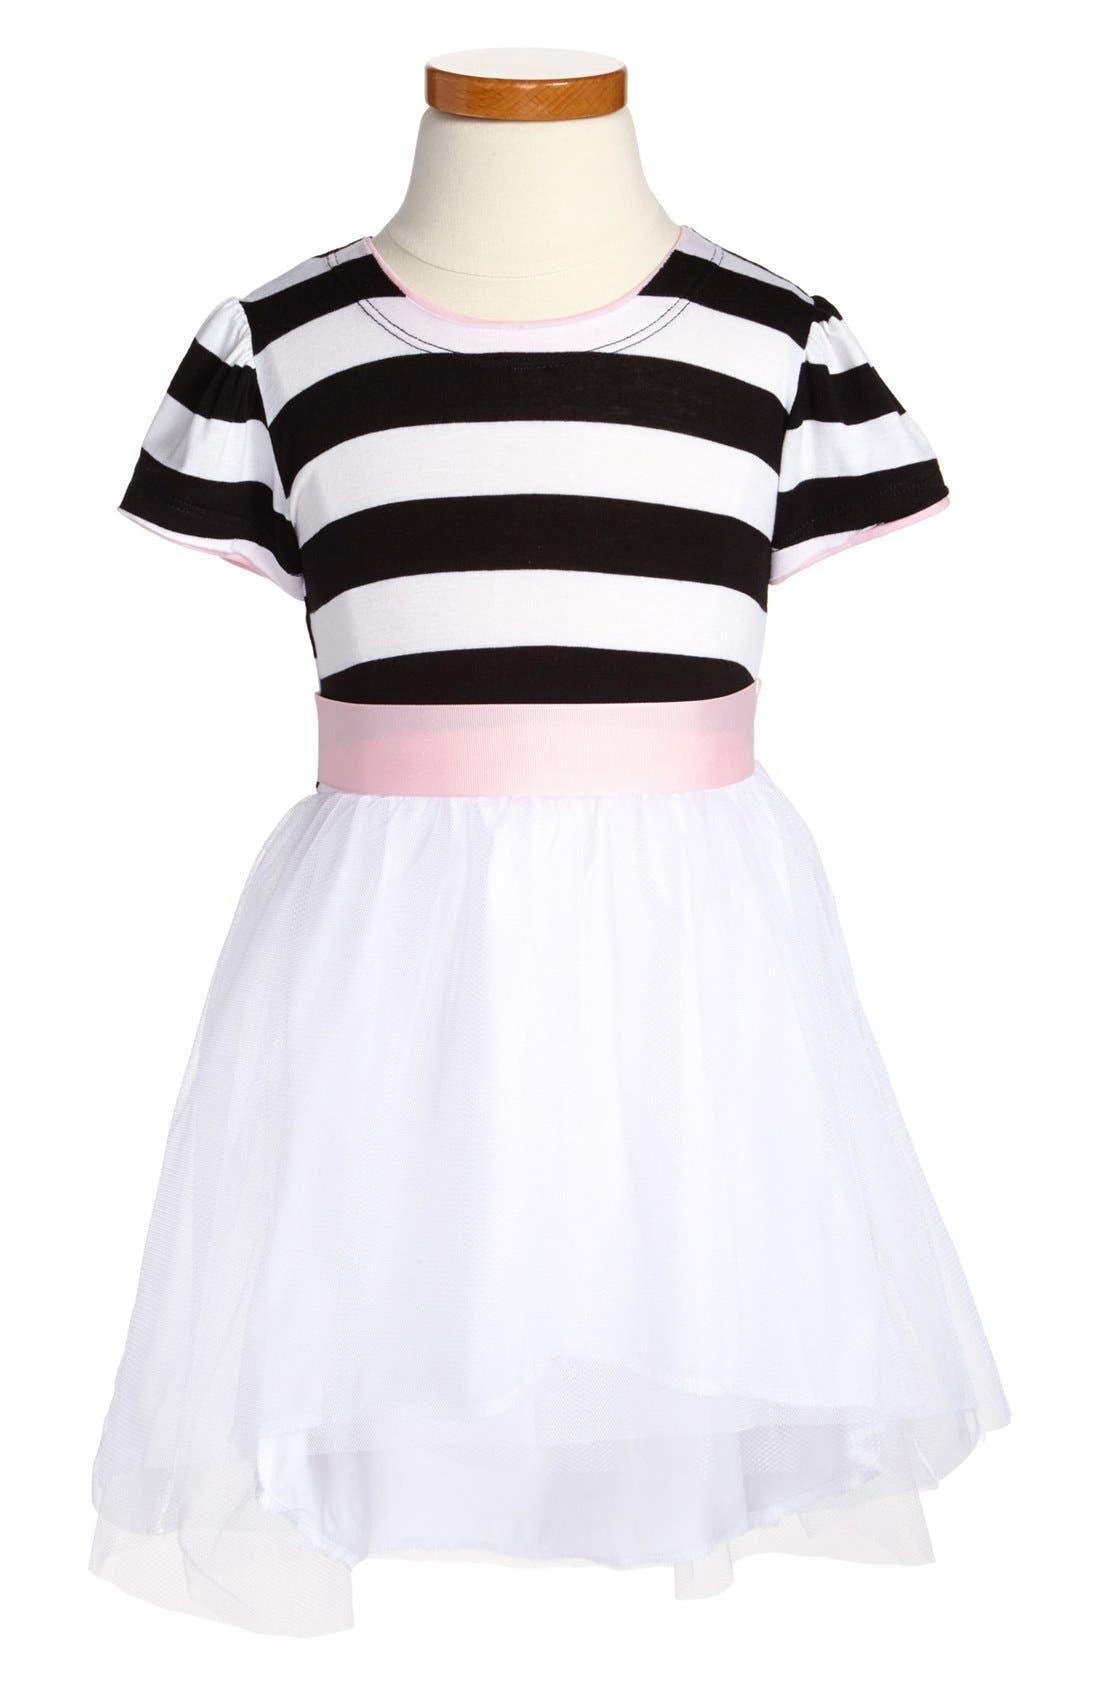 Alternate Image 1 Selected - Twirls & Twigs Stripe Bodice Dress (Little Girls & Big Girls)